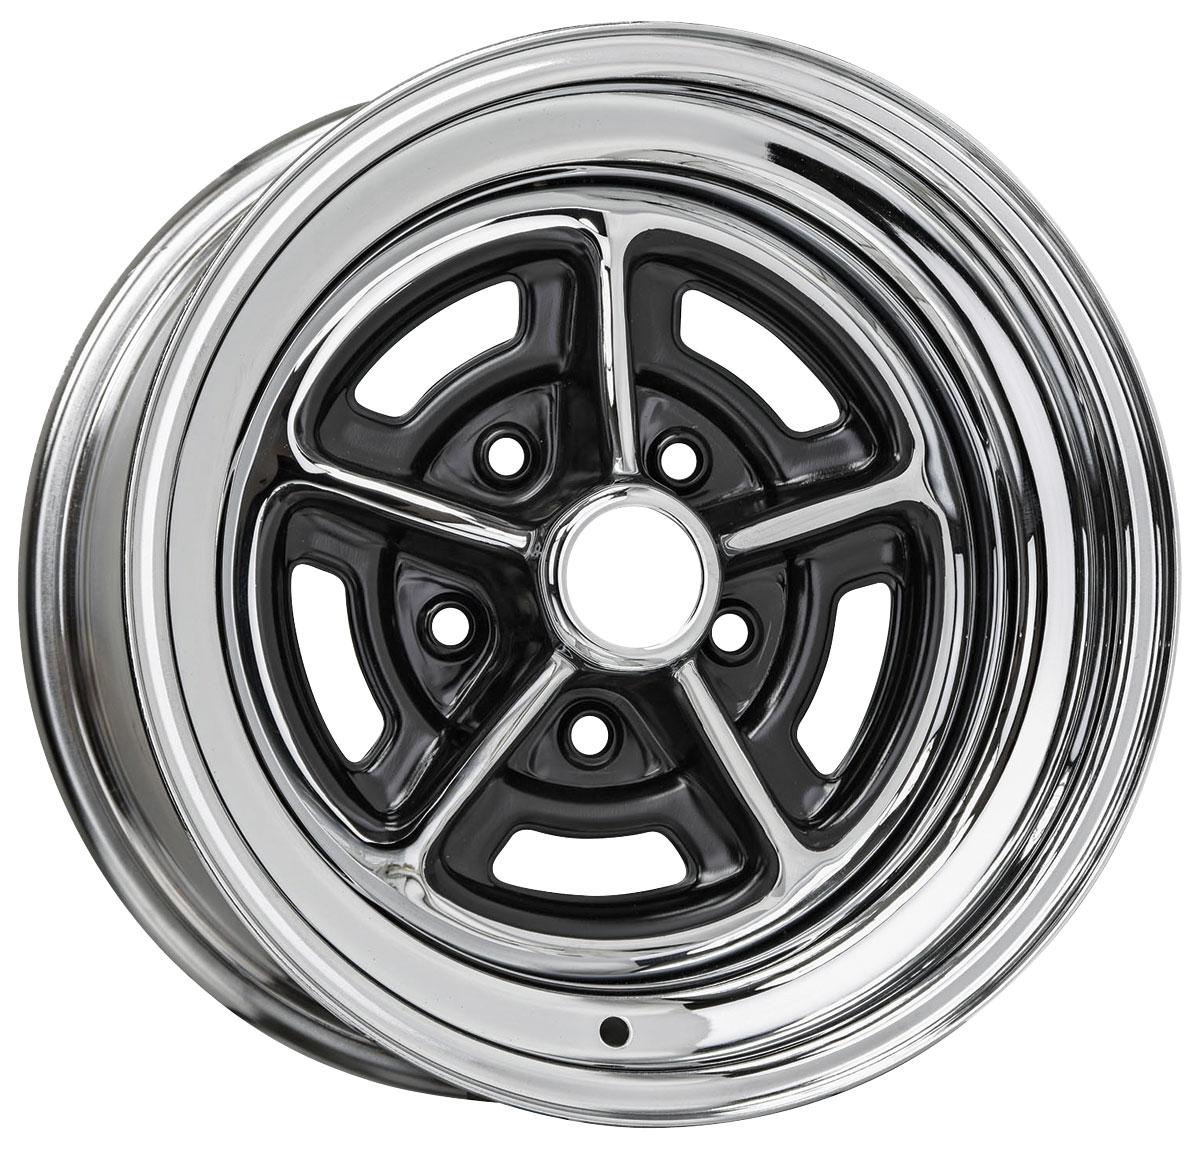 "Wheel, Buick Rally, 15X7, 4"" Back Spacing"